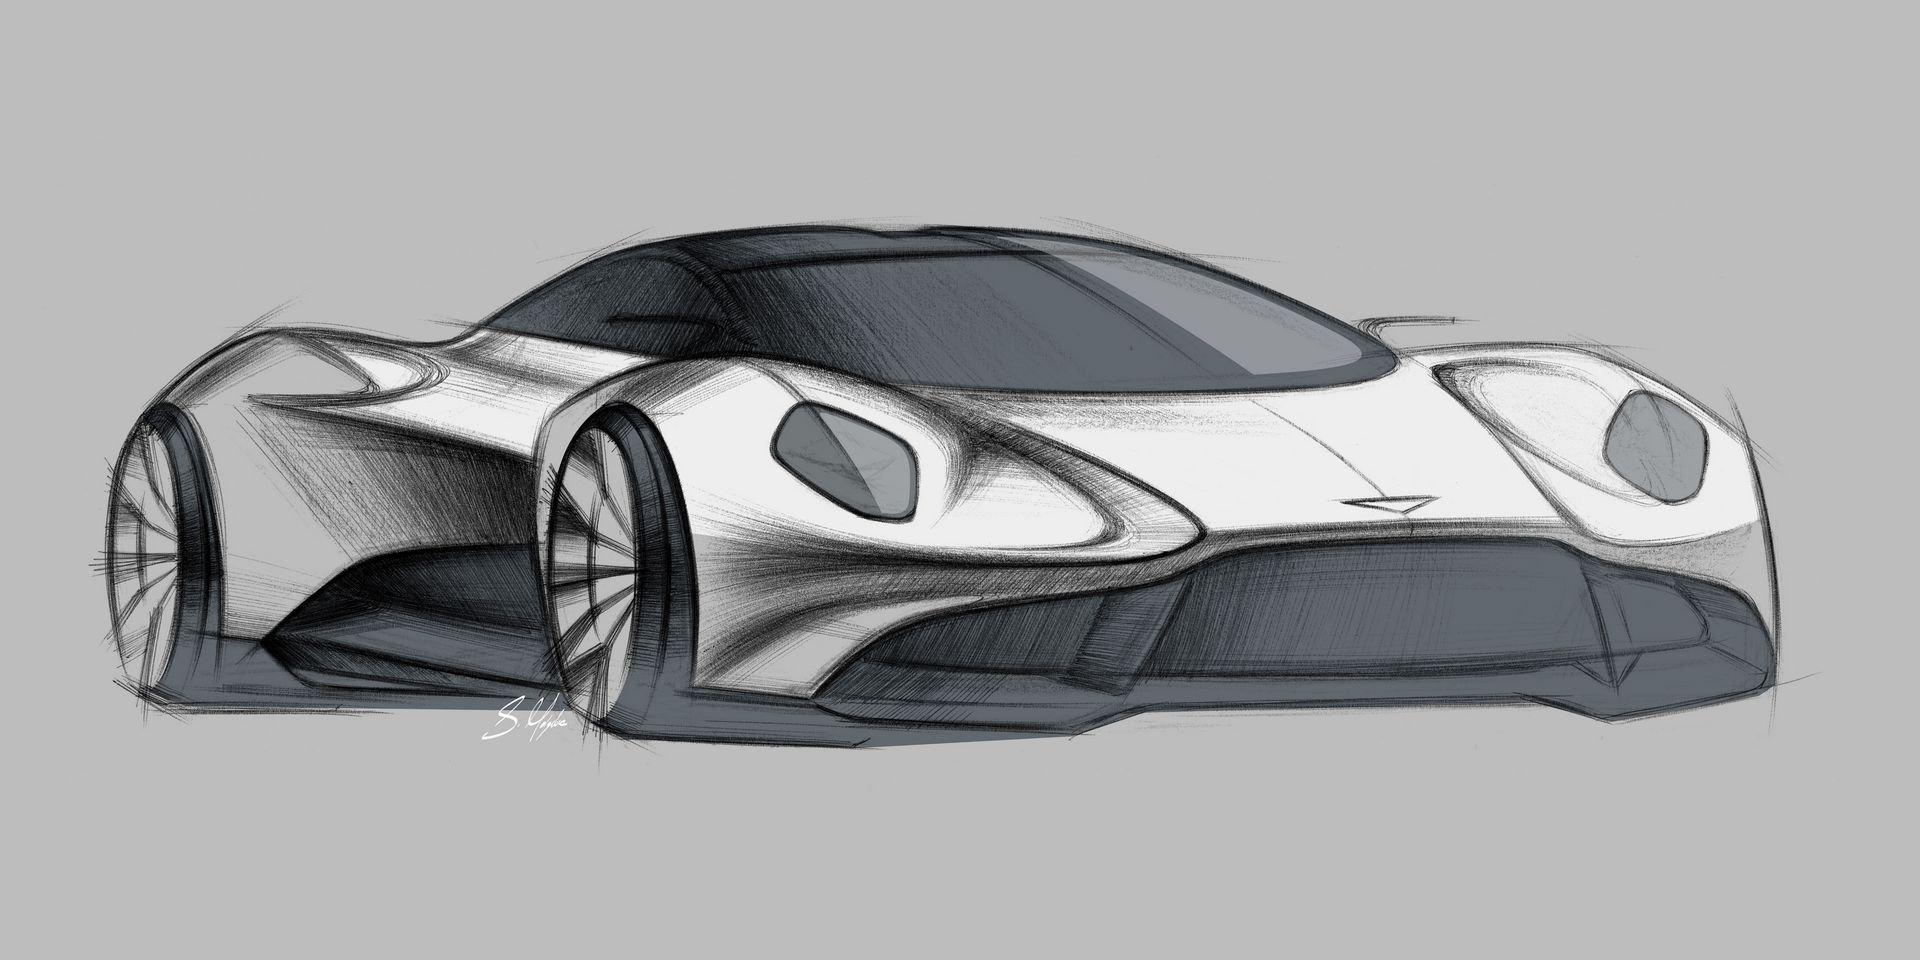 Aston Martin Vanquish Vision Concept (9)